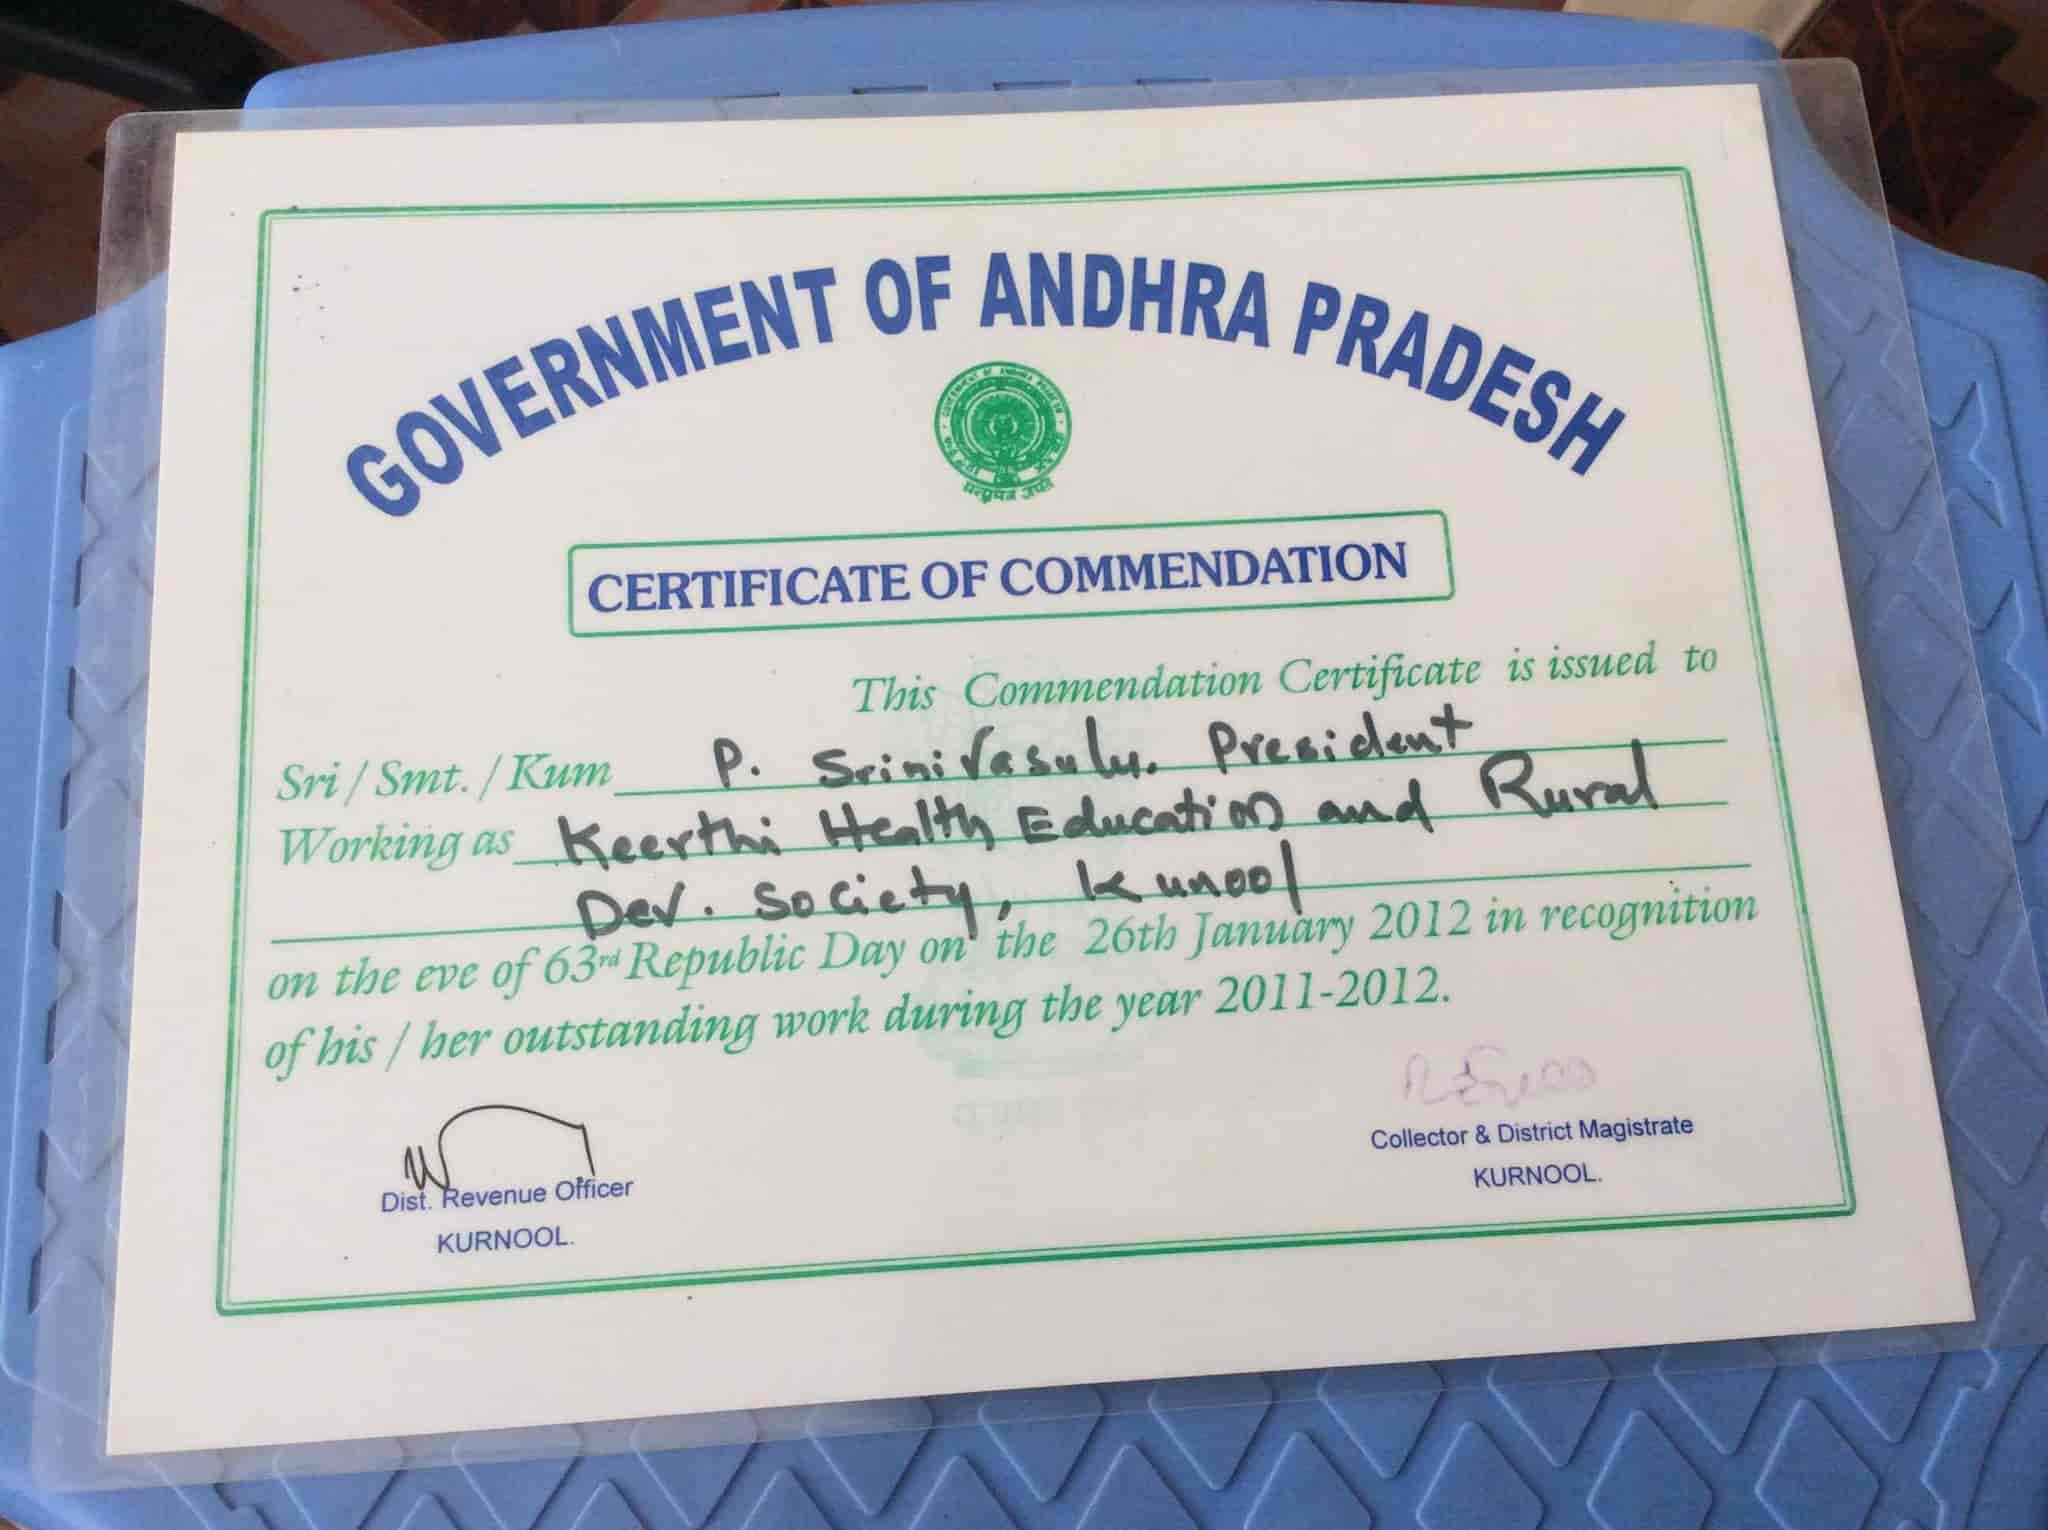 Keerthi Health Educational And Rural Developement Society Budavara